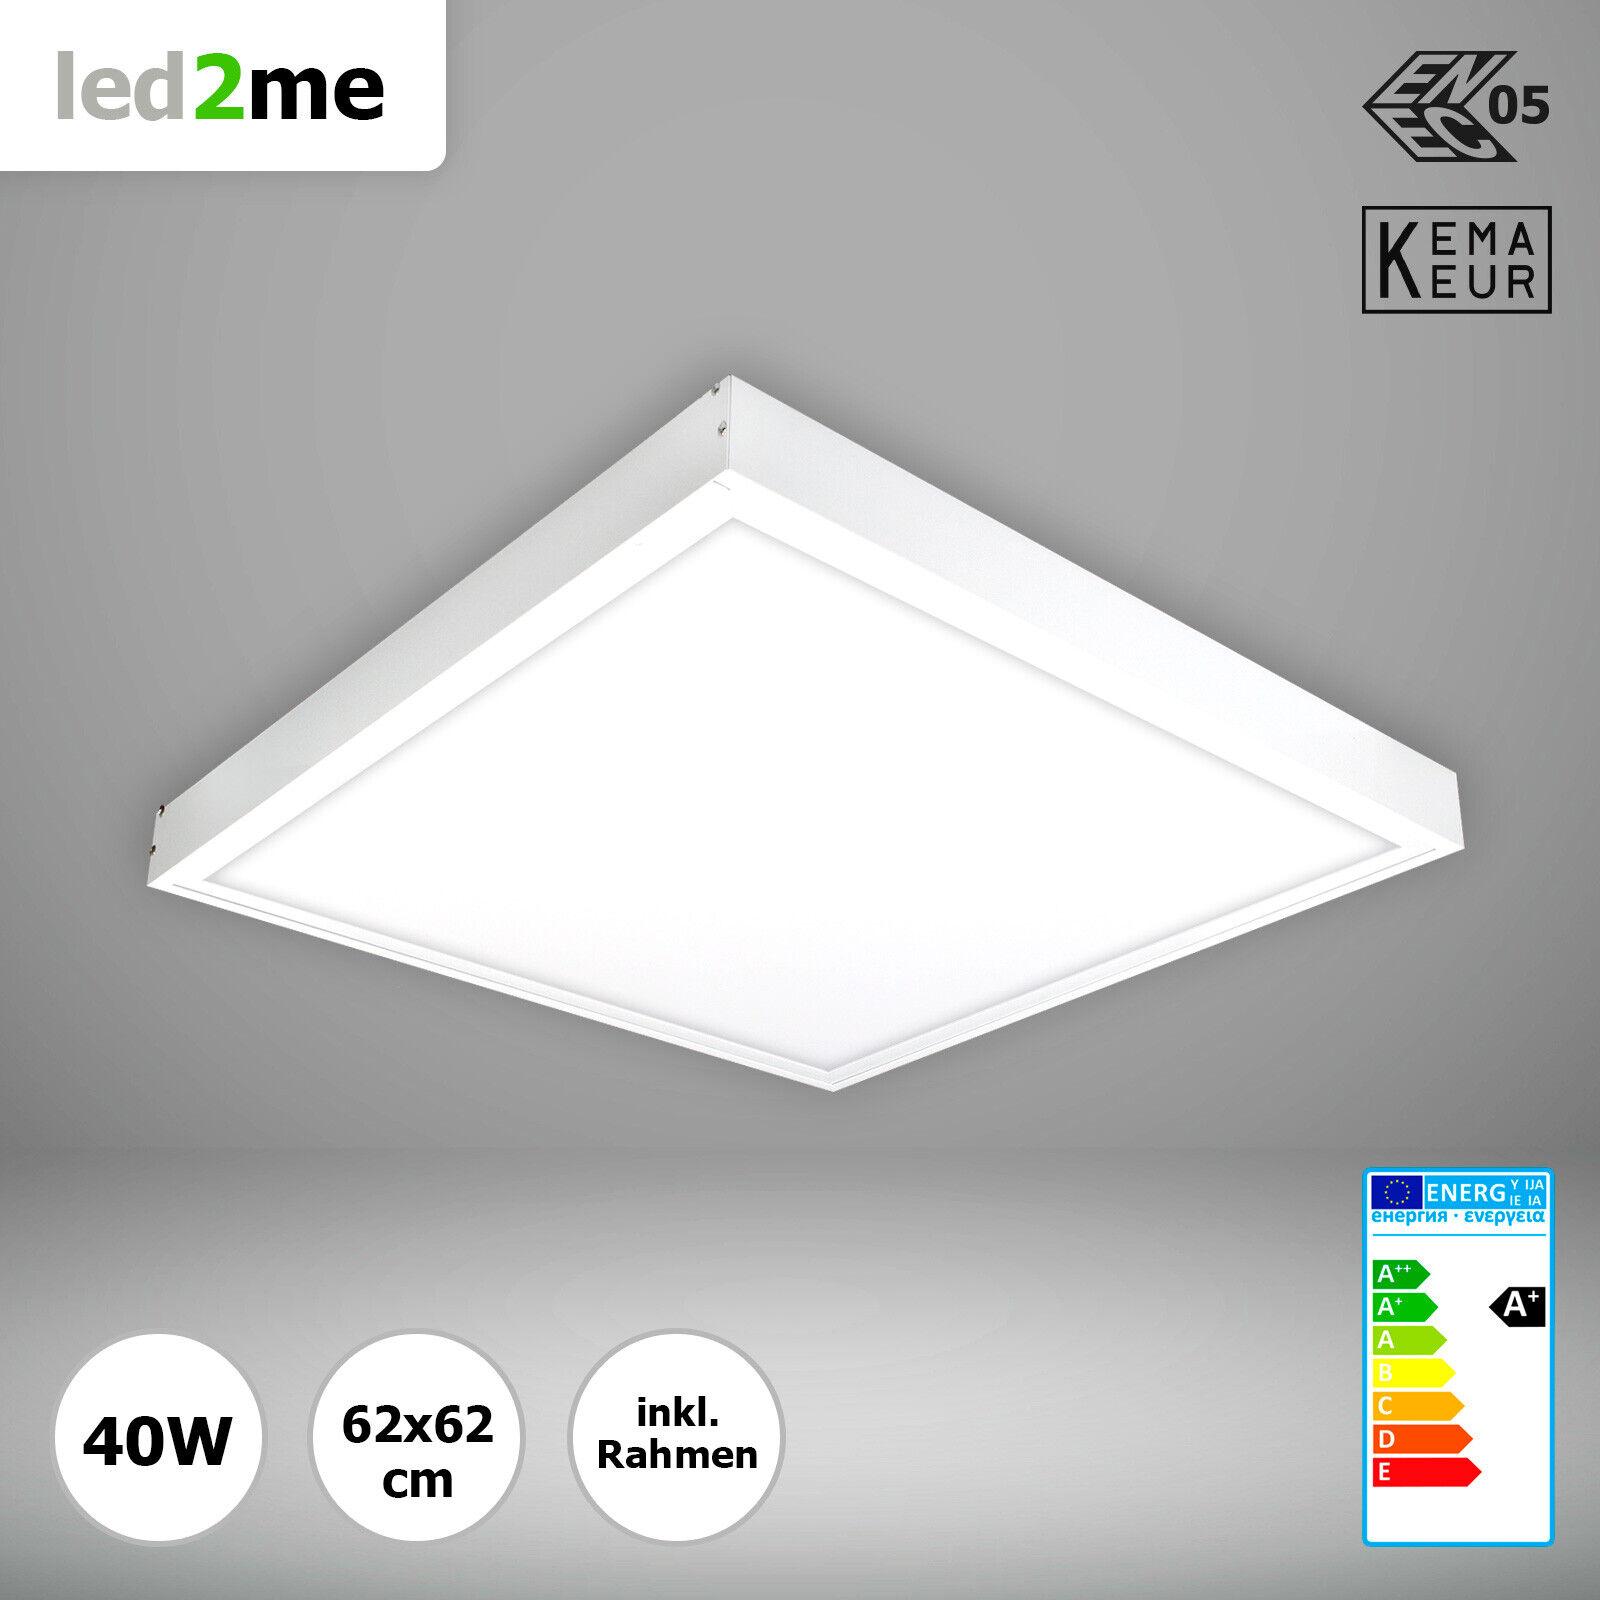 SONDERAKTION Xtend LED Panel 62x62 Tageslicht 40W + Aufputz Montagerahmen